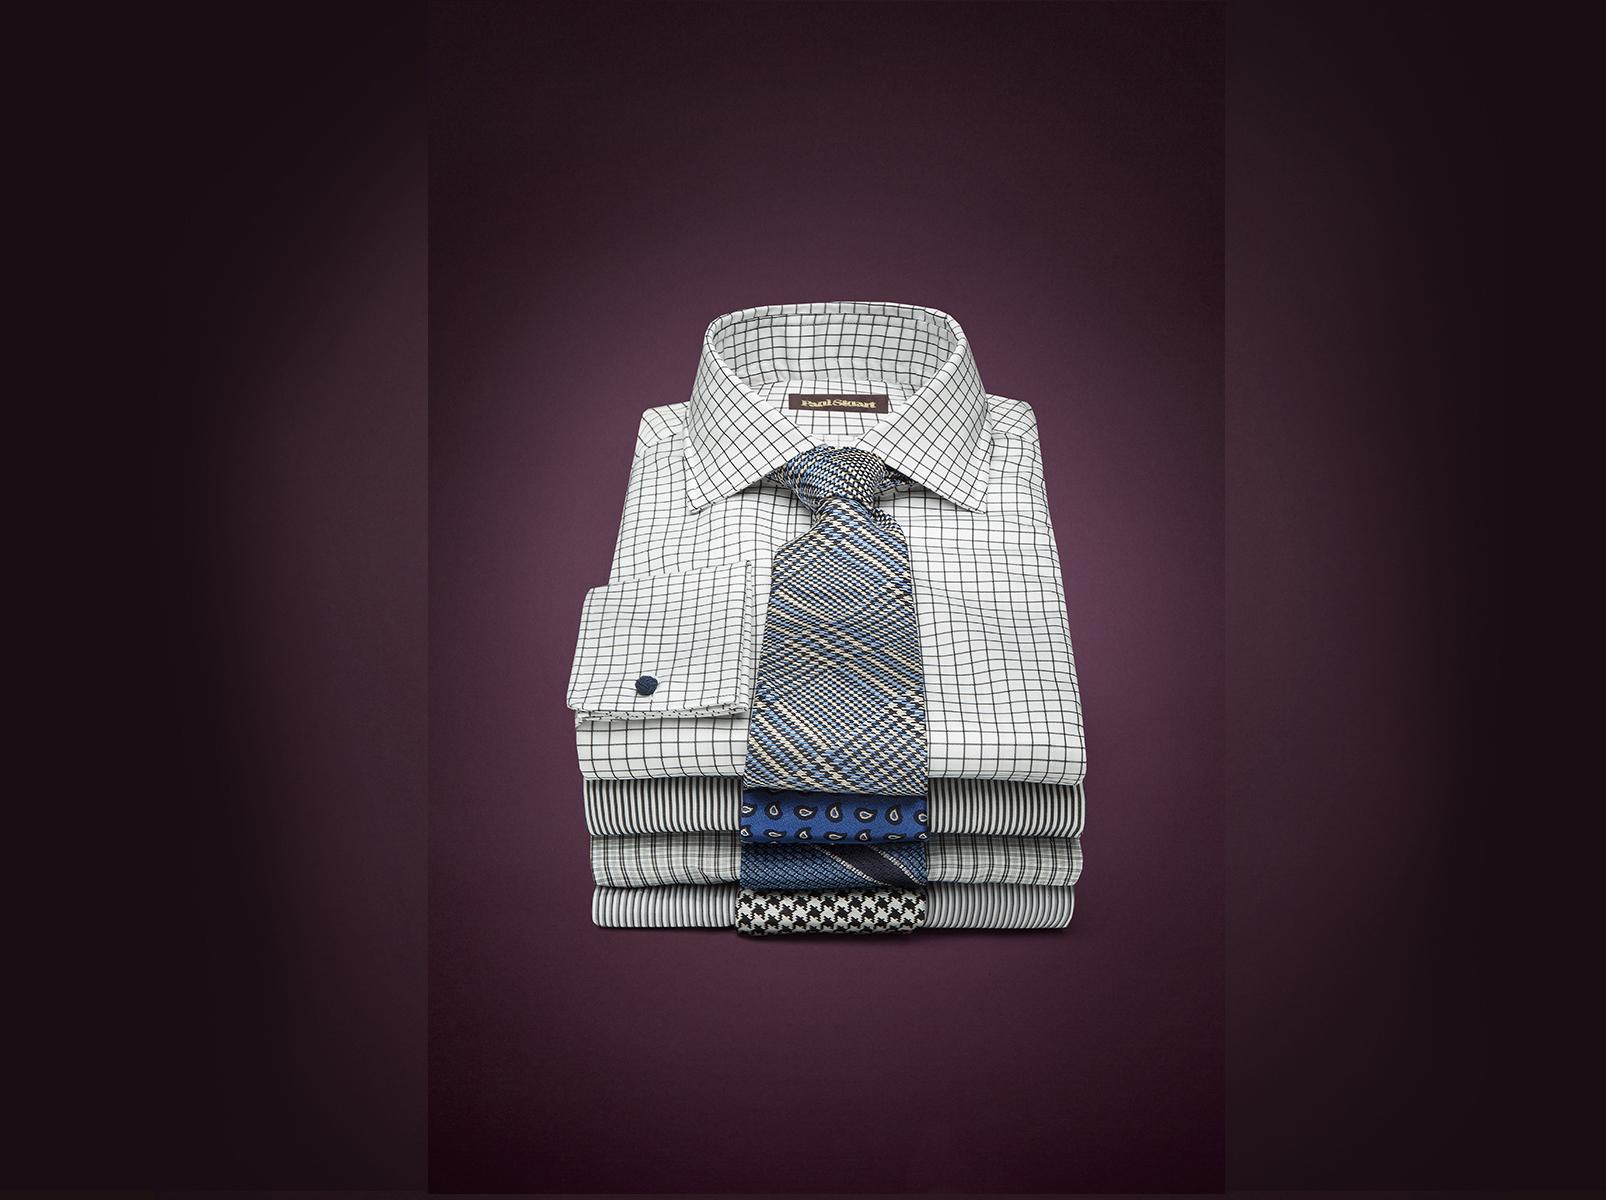 shirt-tie-stack-editorial.jpg